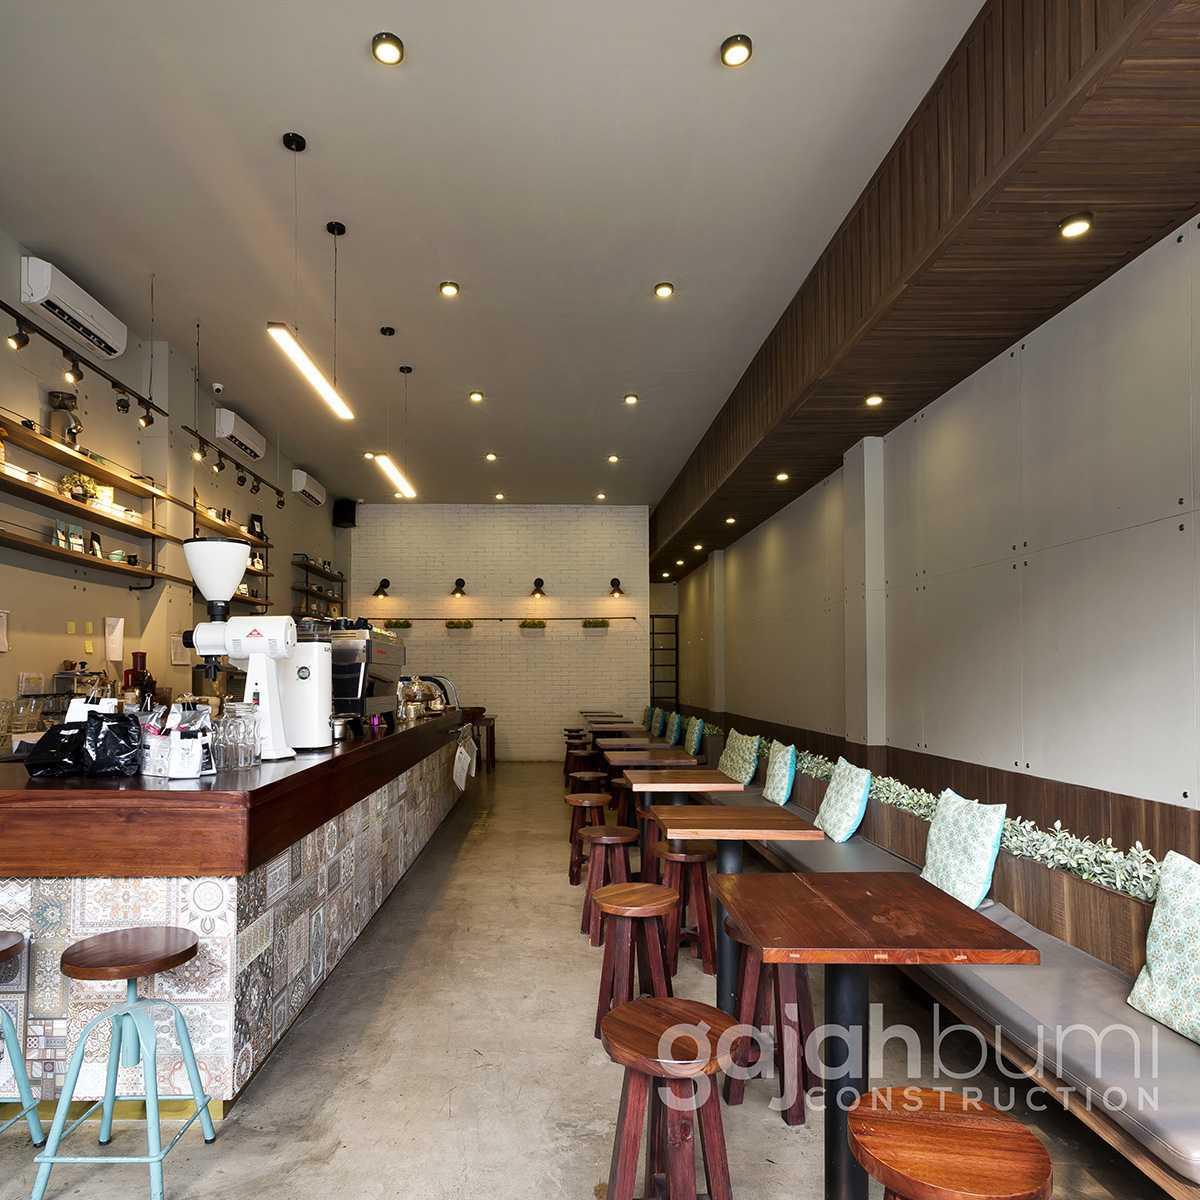 Gajah Bumi Construction Ottoman's Coffee  Pluit, Penjaringan, Kota Jkt Utara, Daerah Khusus Ibukota Jakarta, Indonesia  Gajah-Bumi-Construction-Ottomans-Coffee-   54643